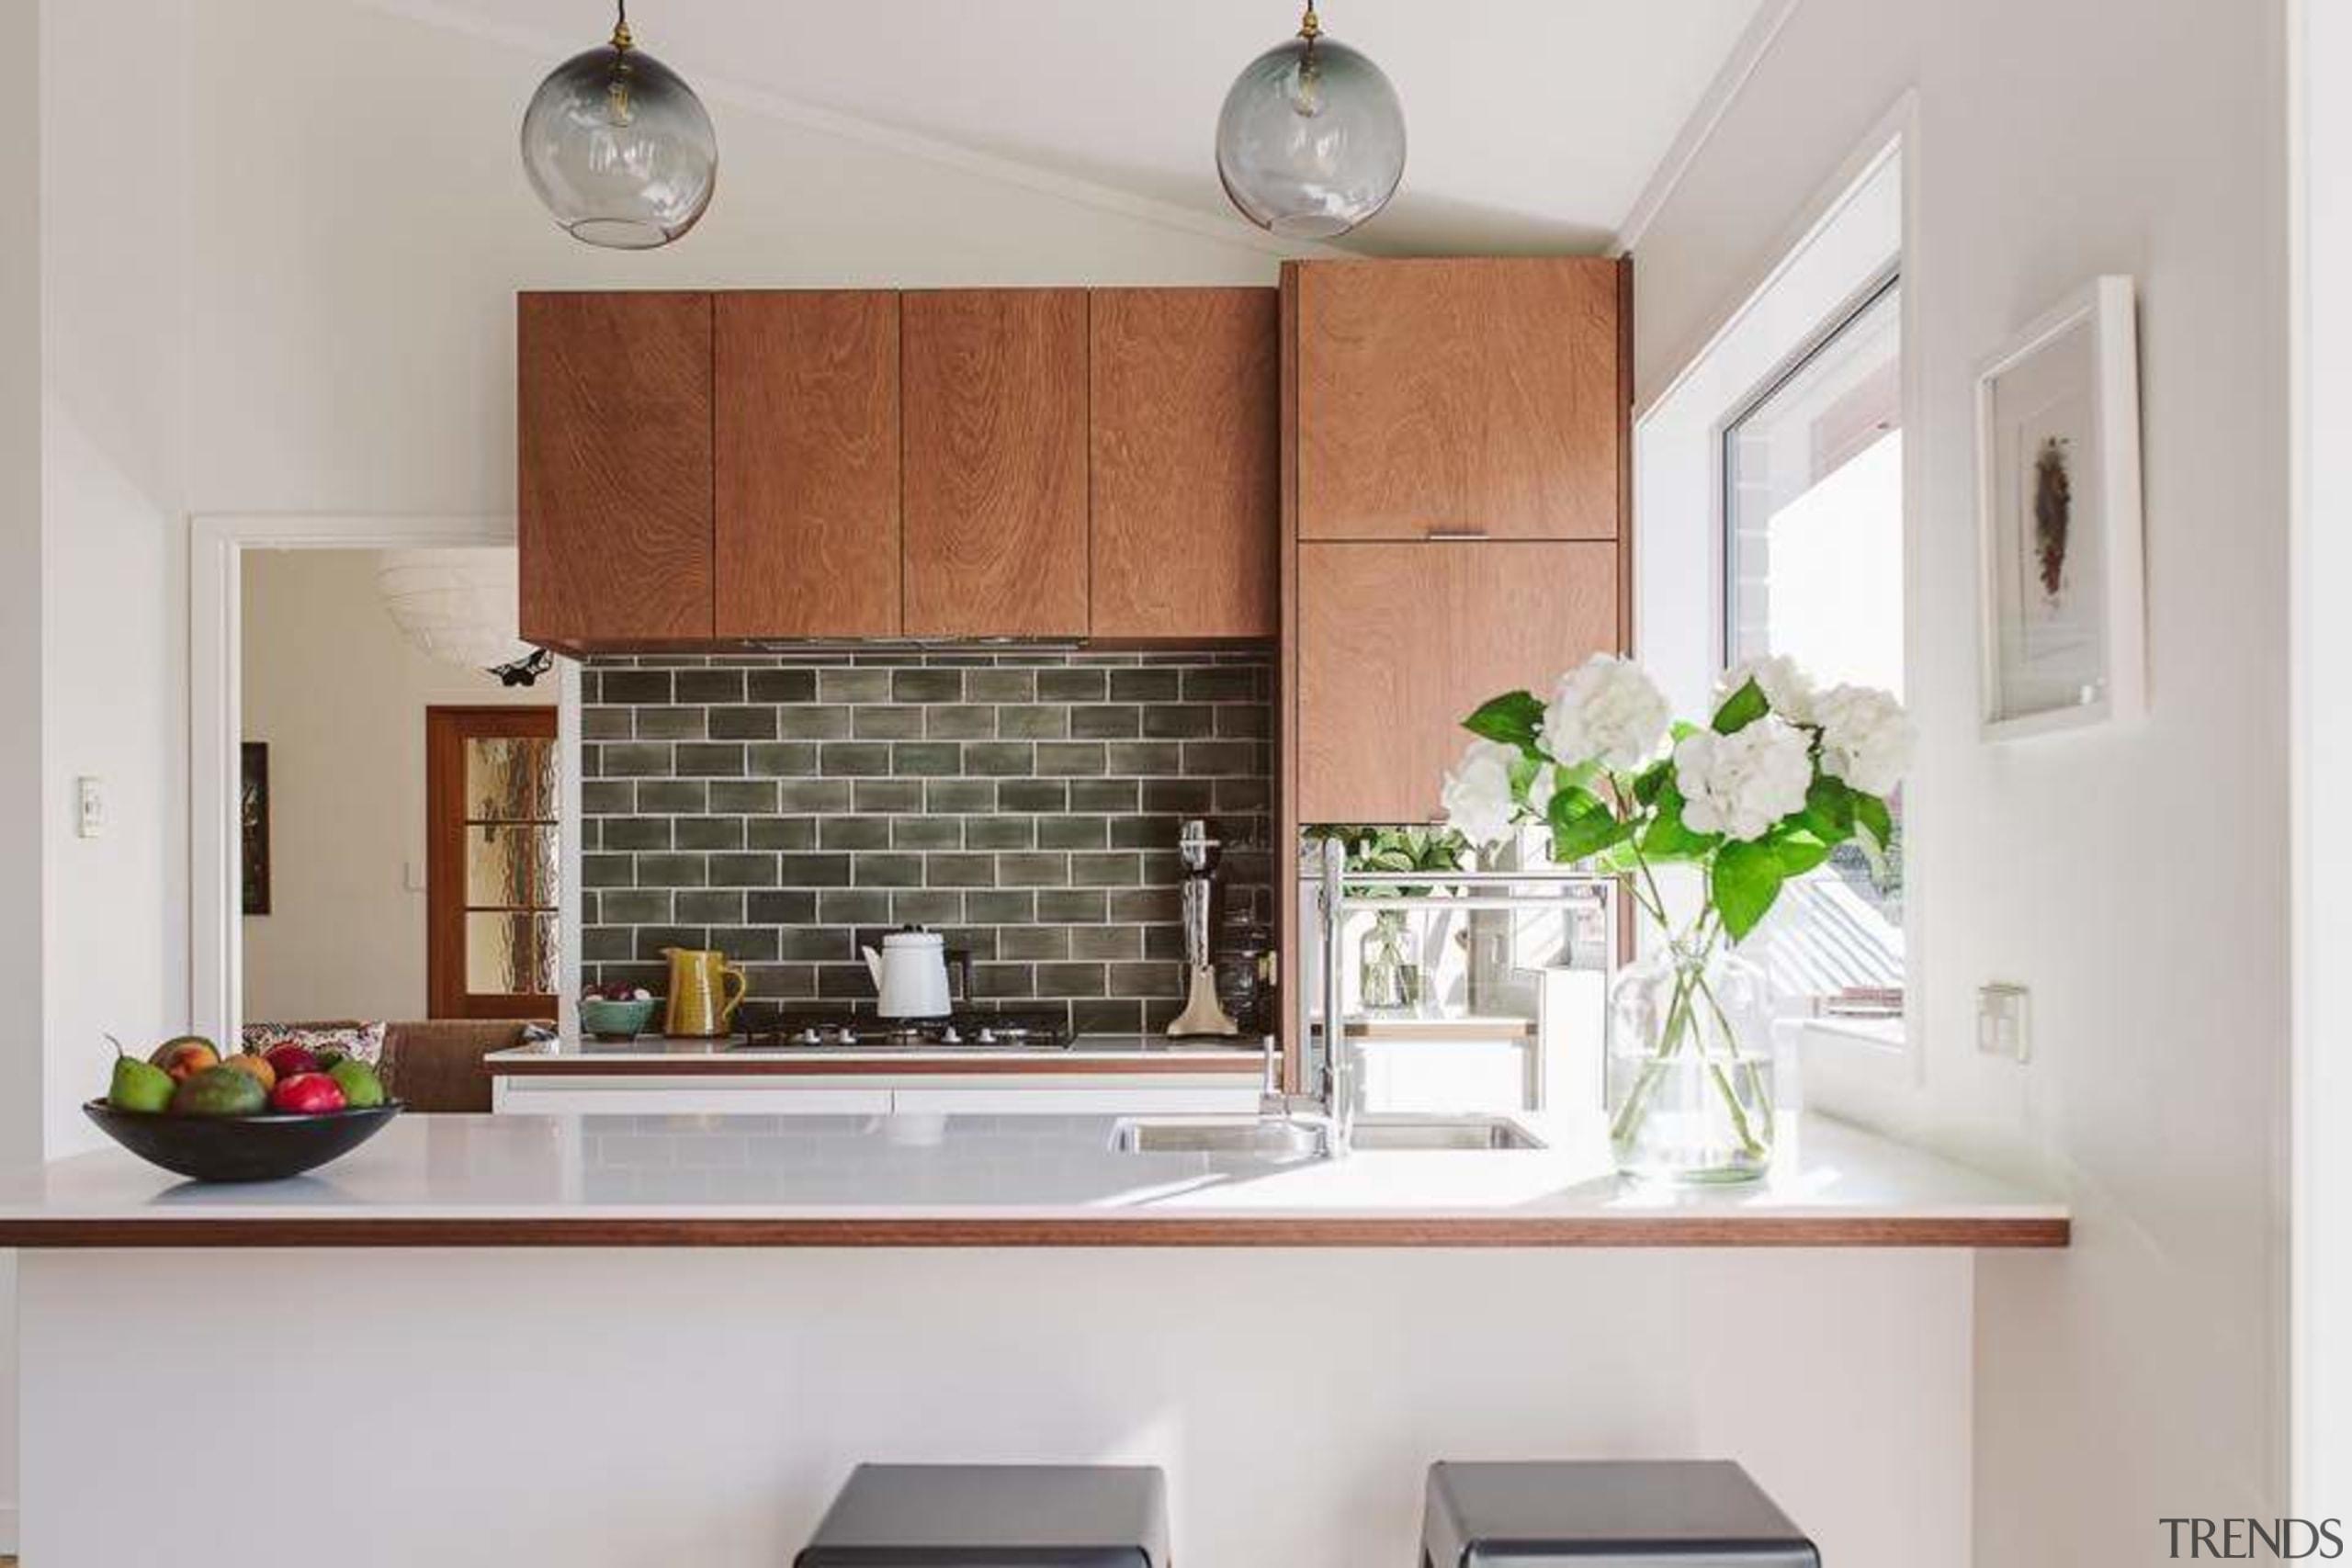 Rowson Kitchen & Joinery - Rowson Kitchen & countertop, home, interior design, kitchen, property, gray